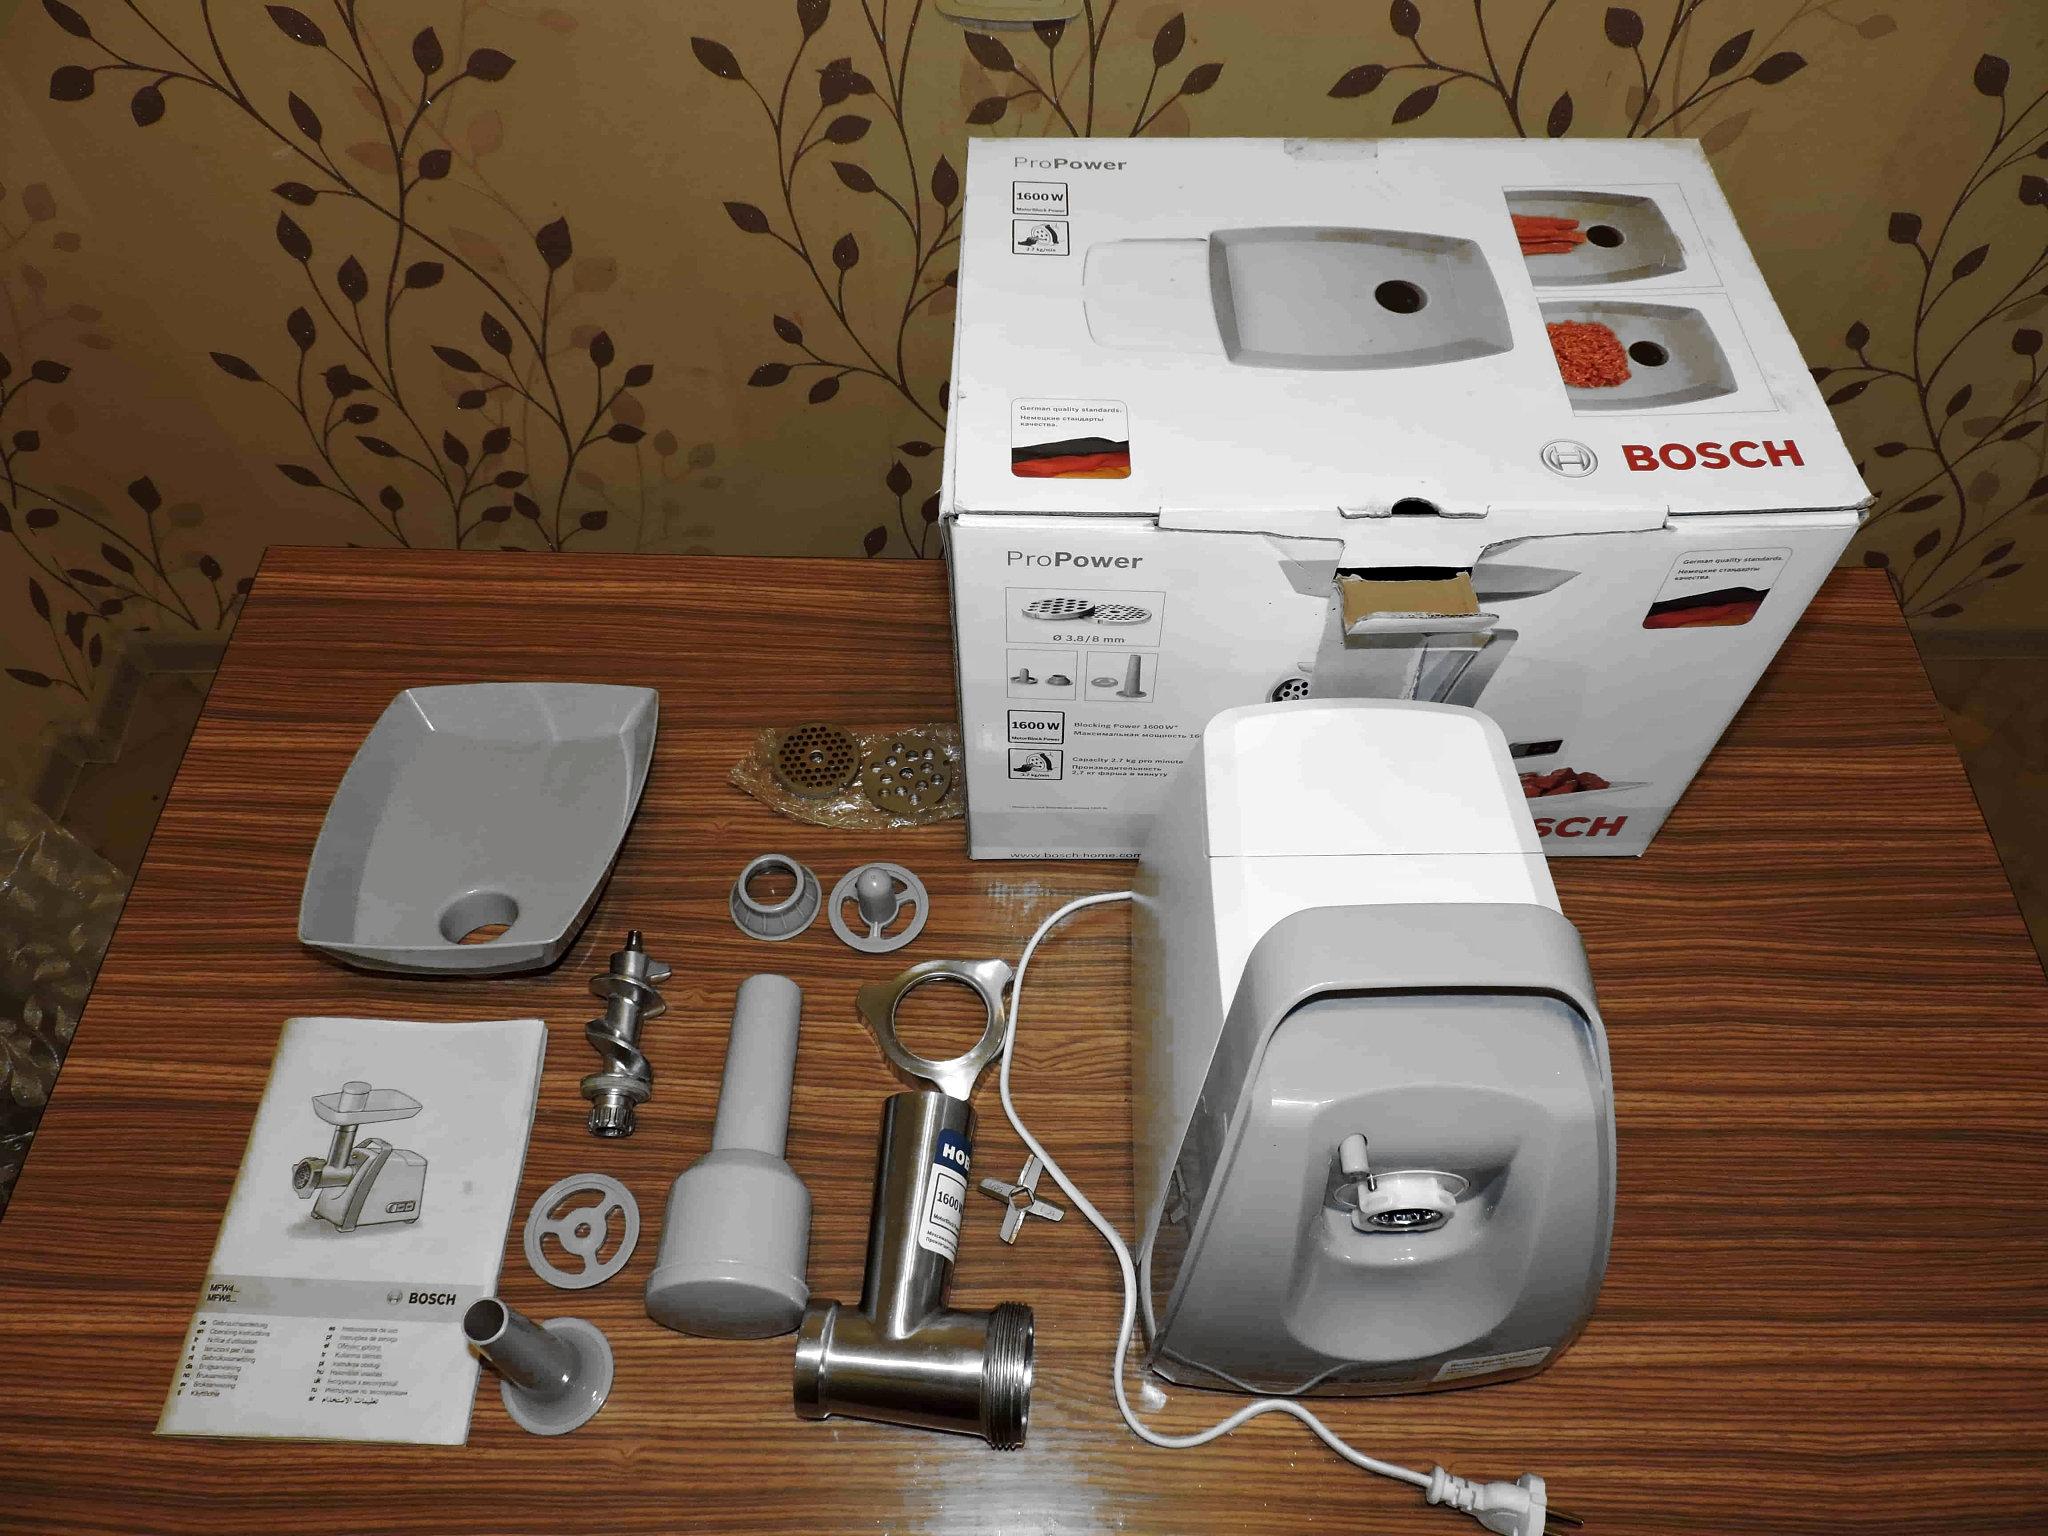 Bosch MFW 45020/45120 ответ специалиста